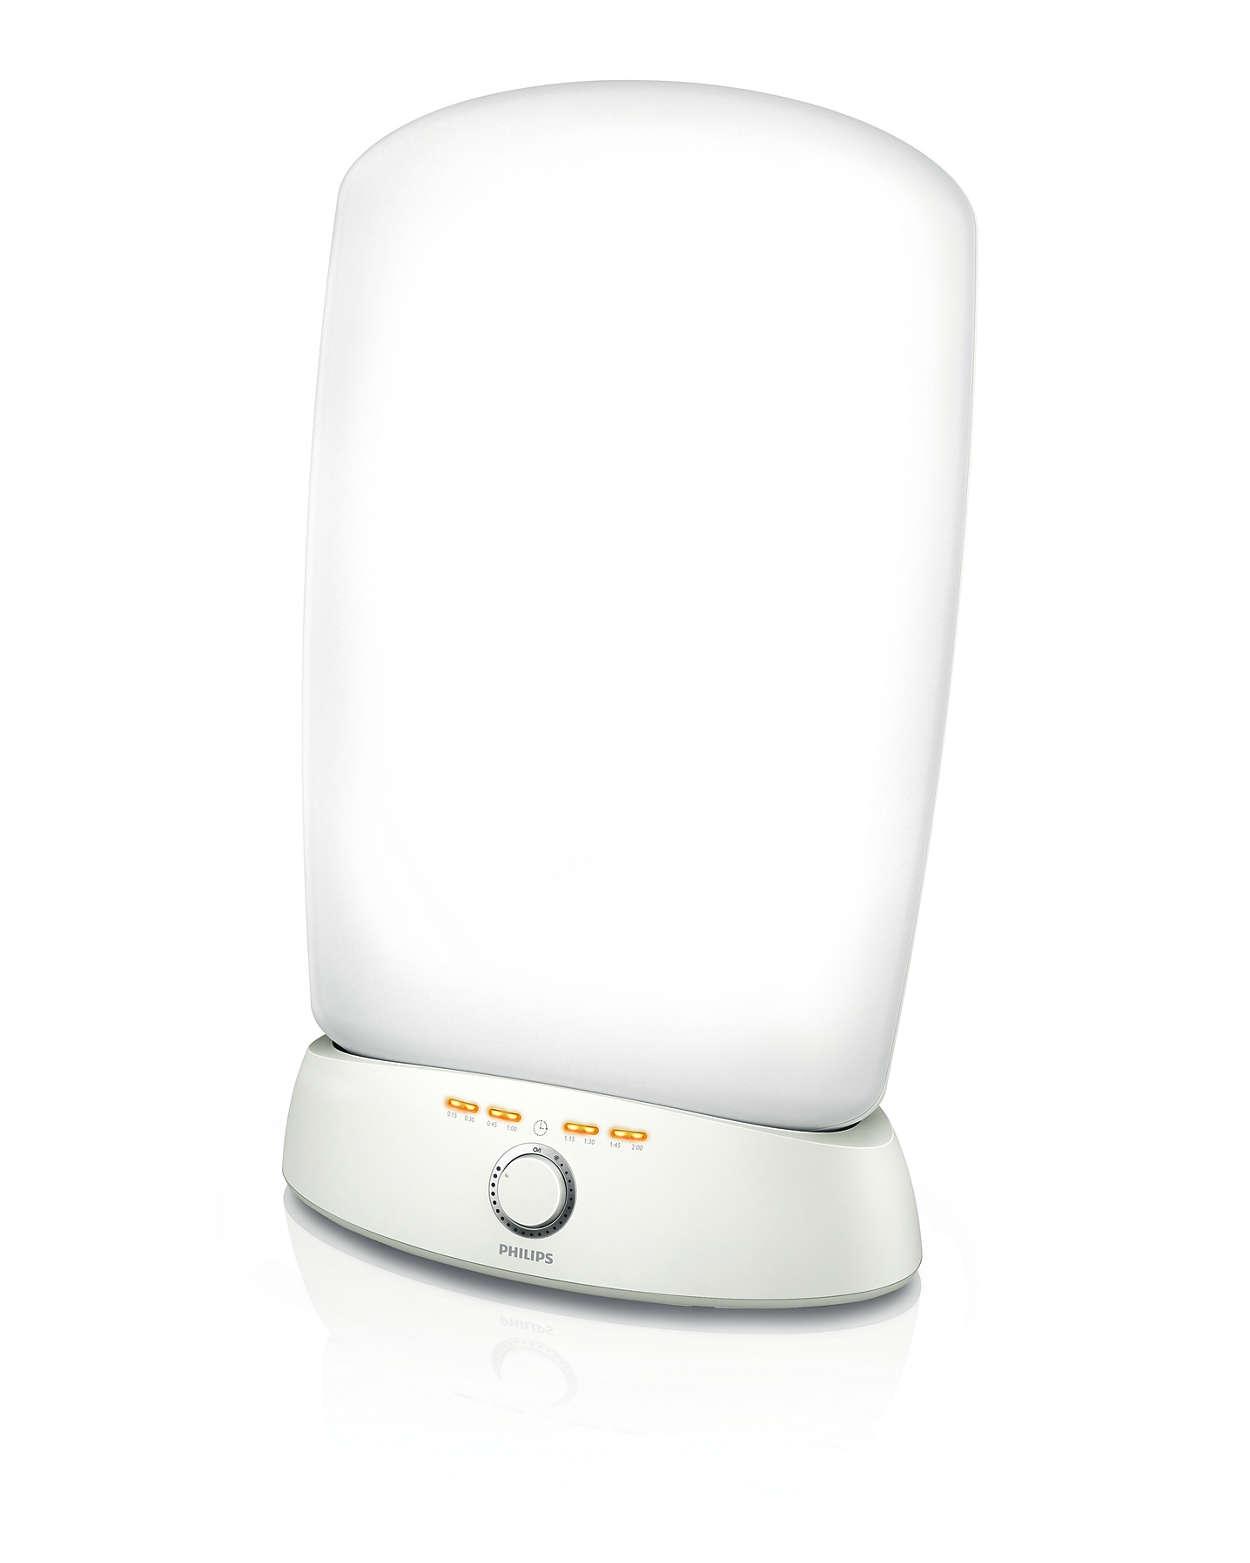 Energylight Hf3319 01 Philips